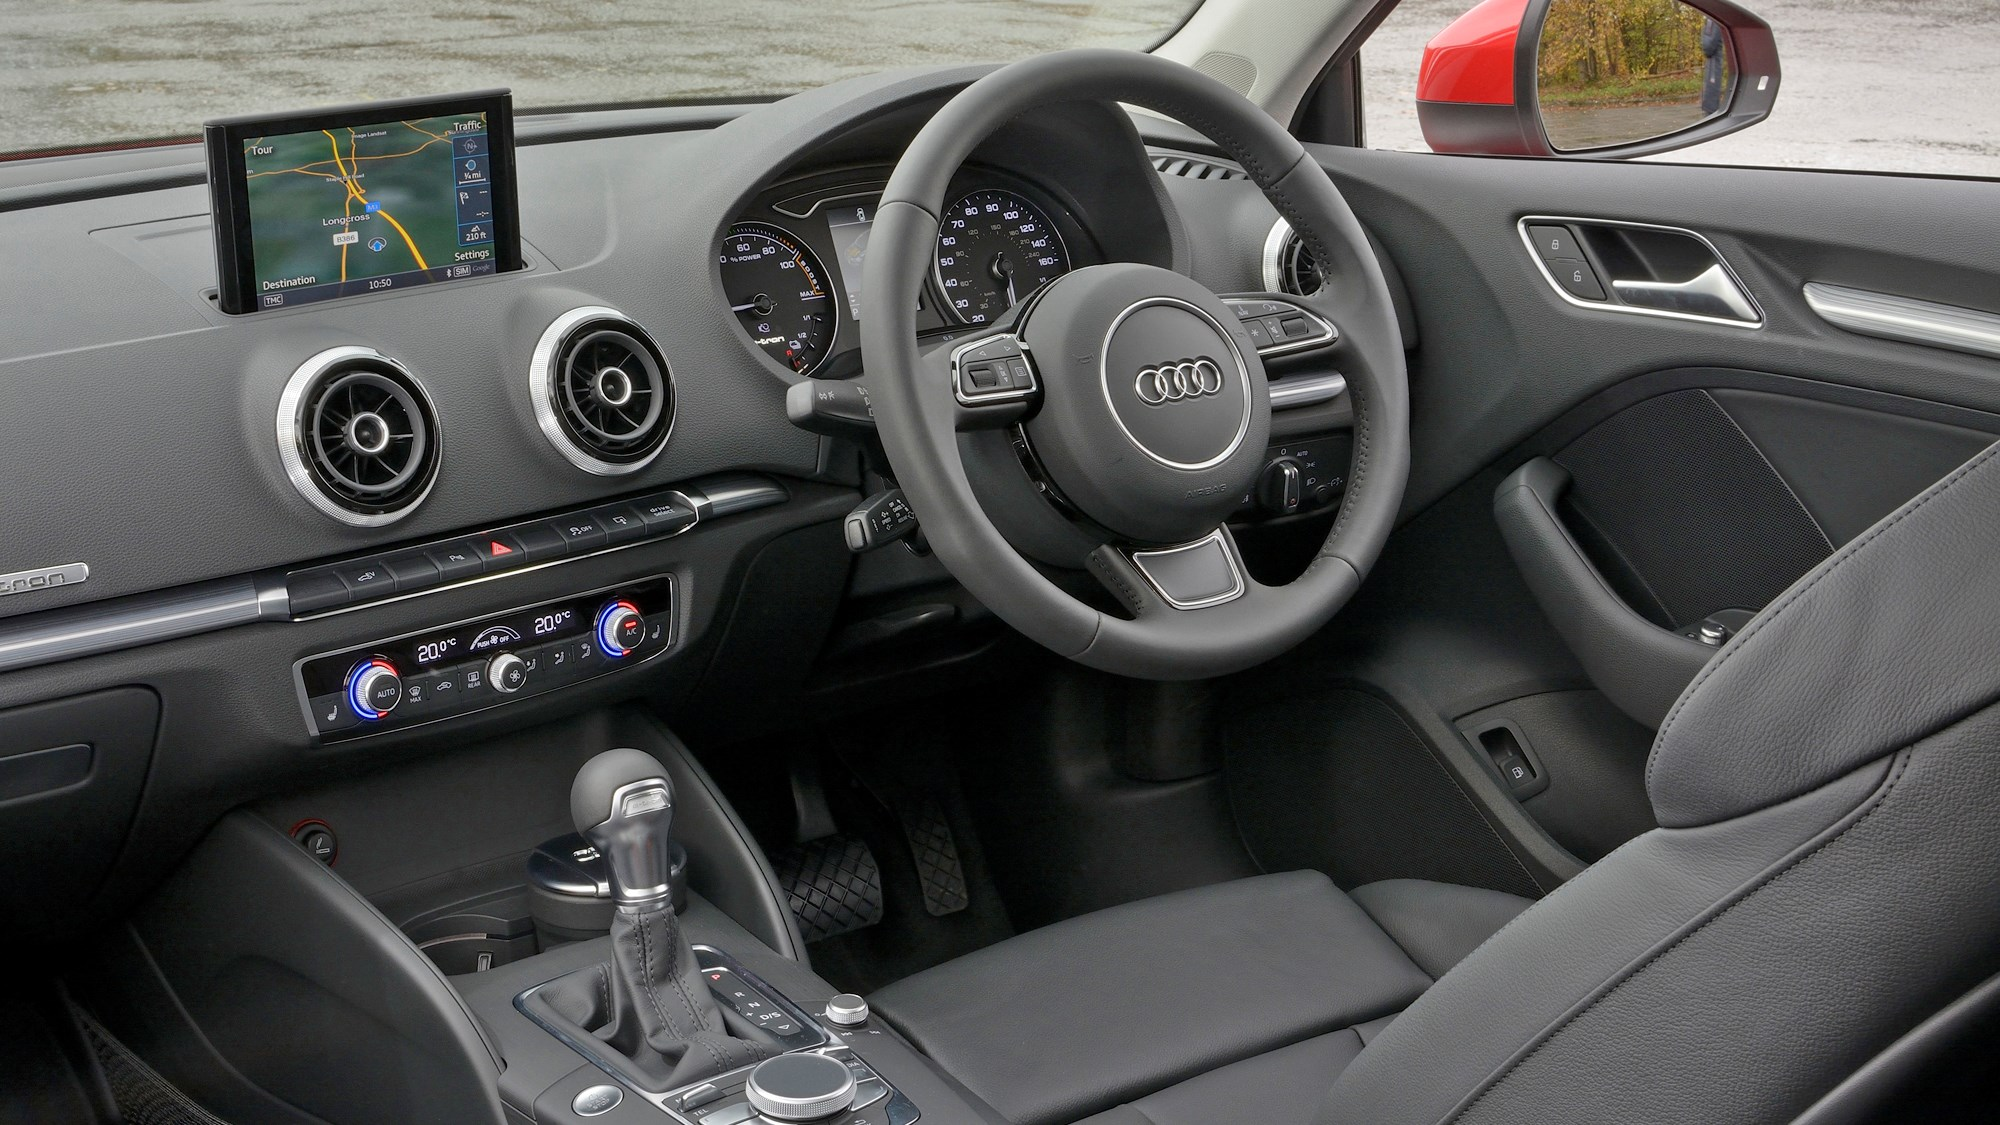 2014 Audi A3 Sportback e-Tron dashboard